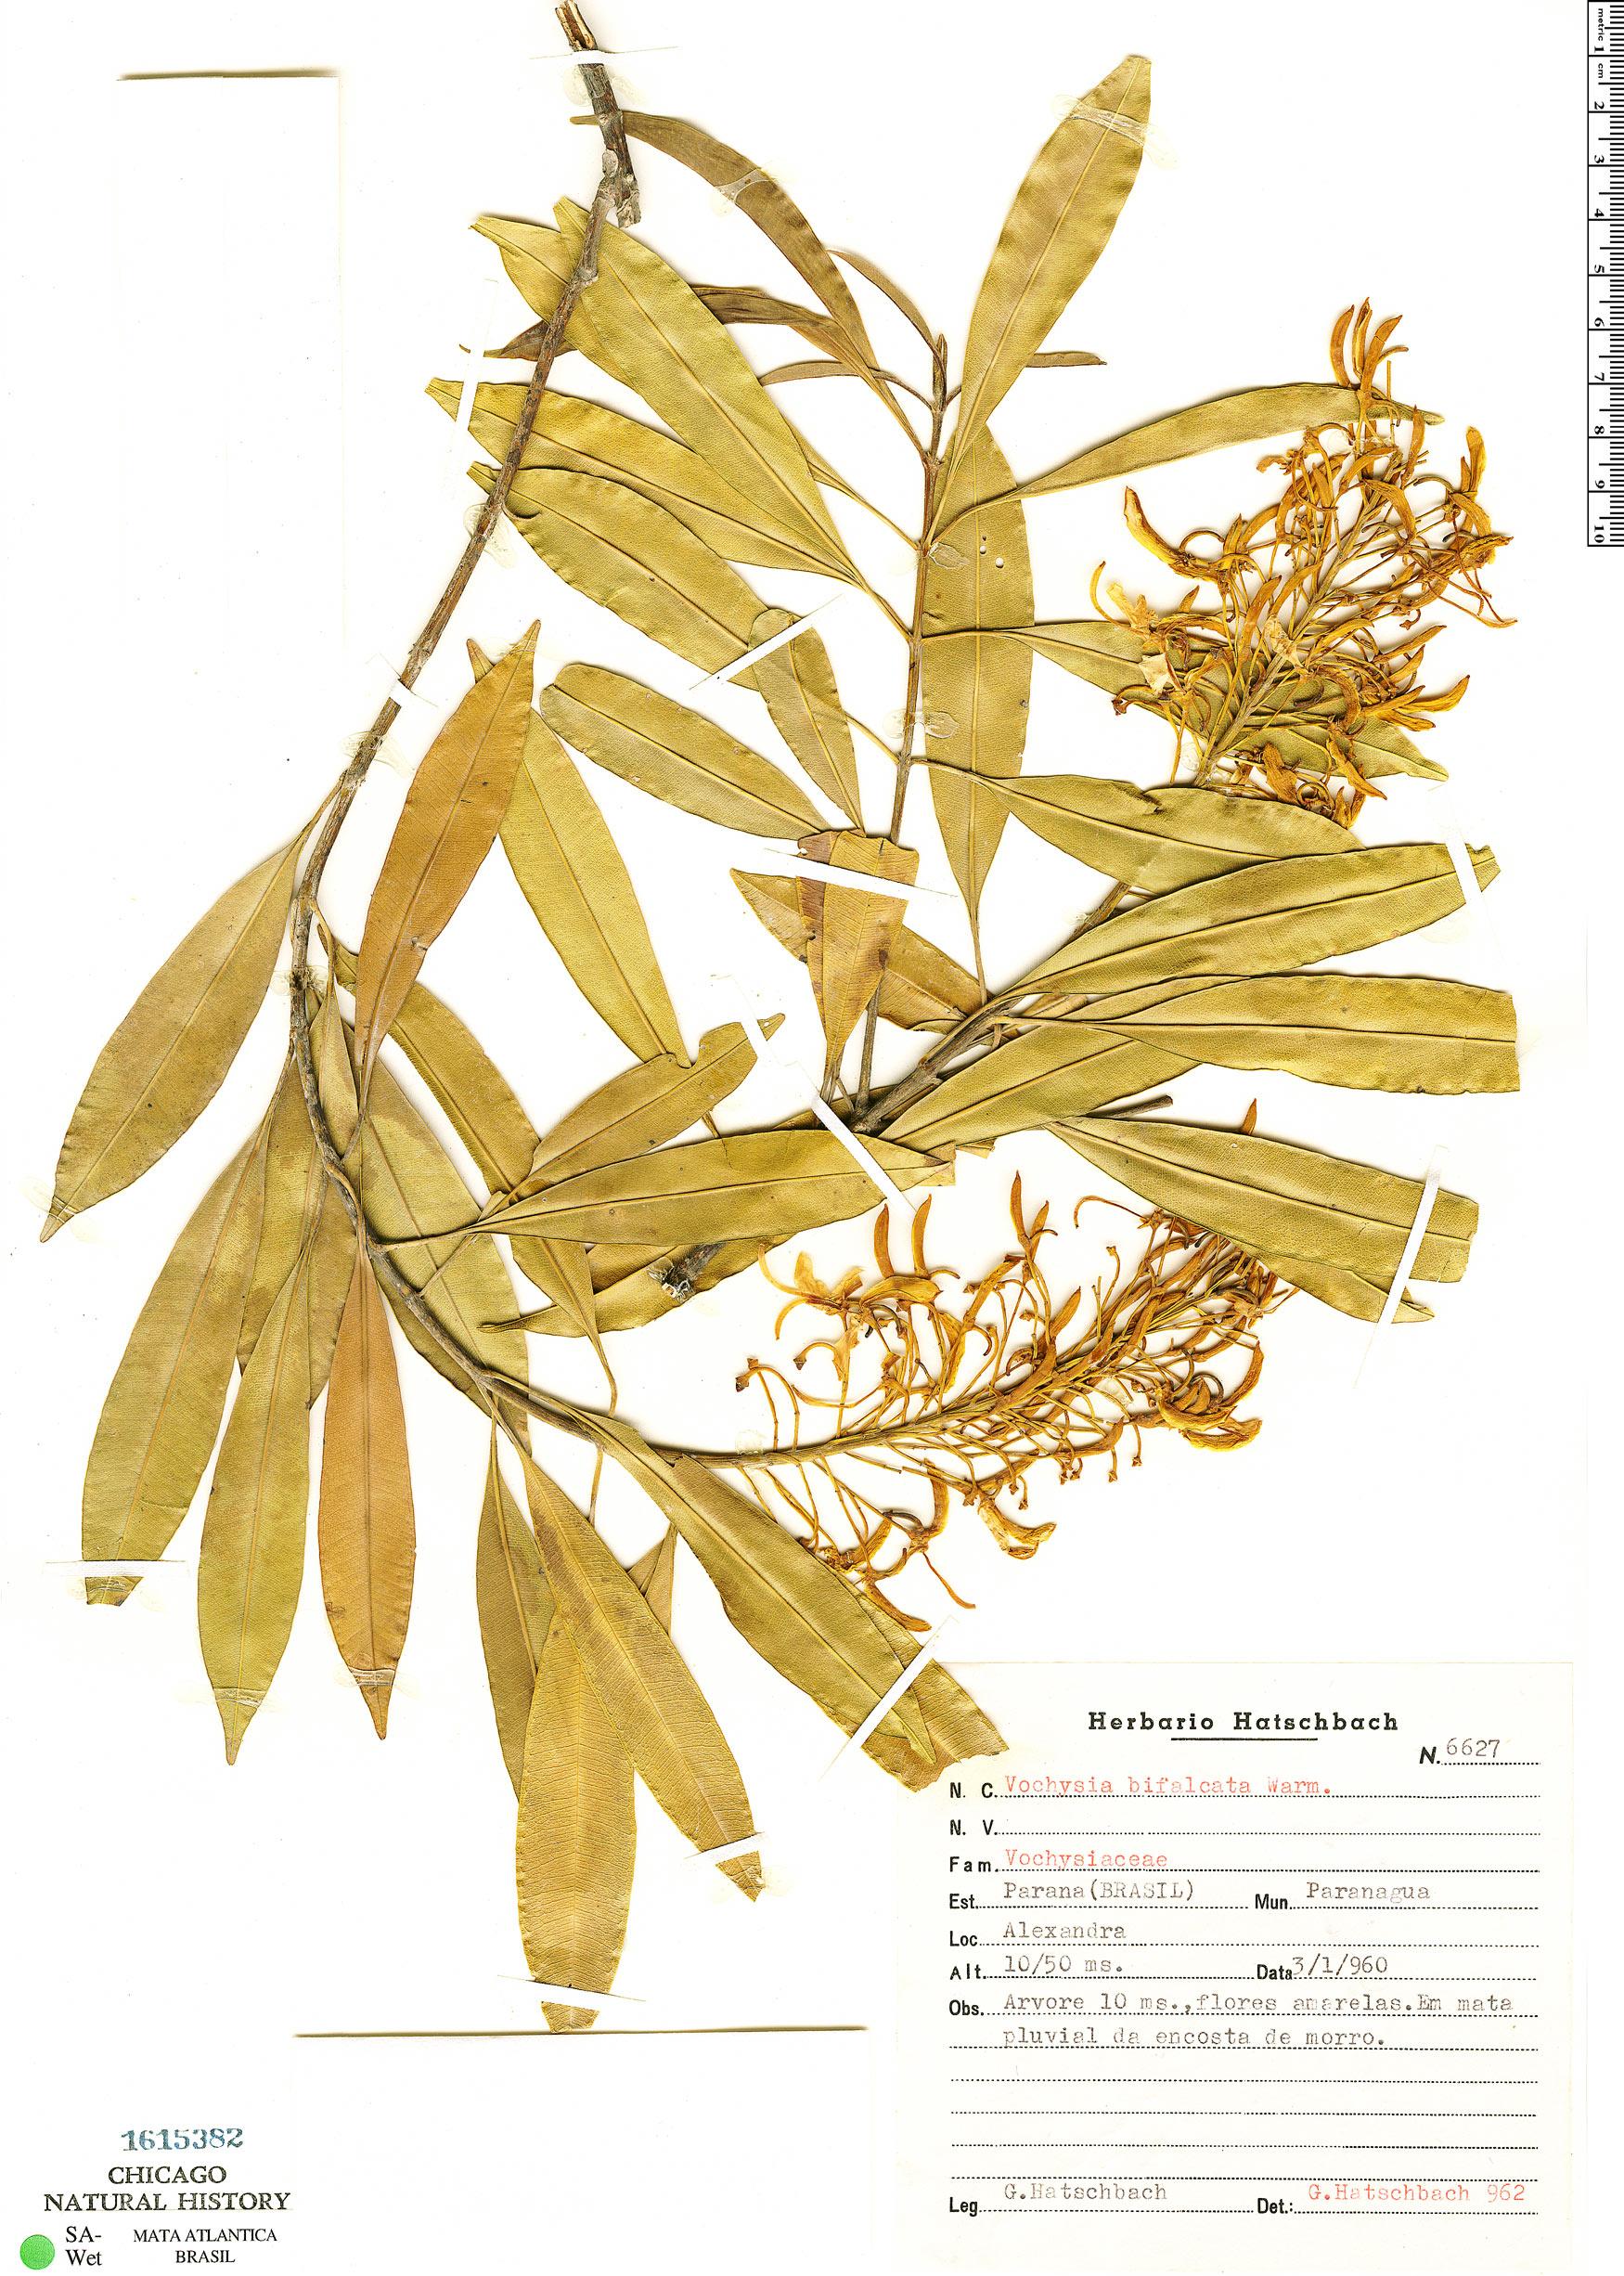 Specimen: Vochysia bifalcata